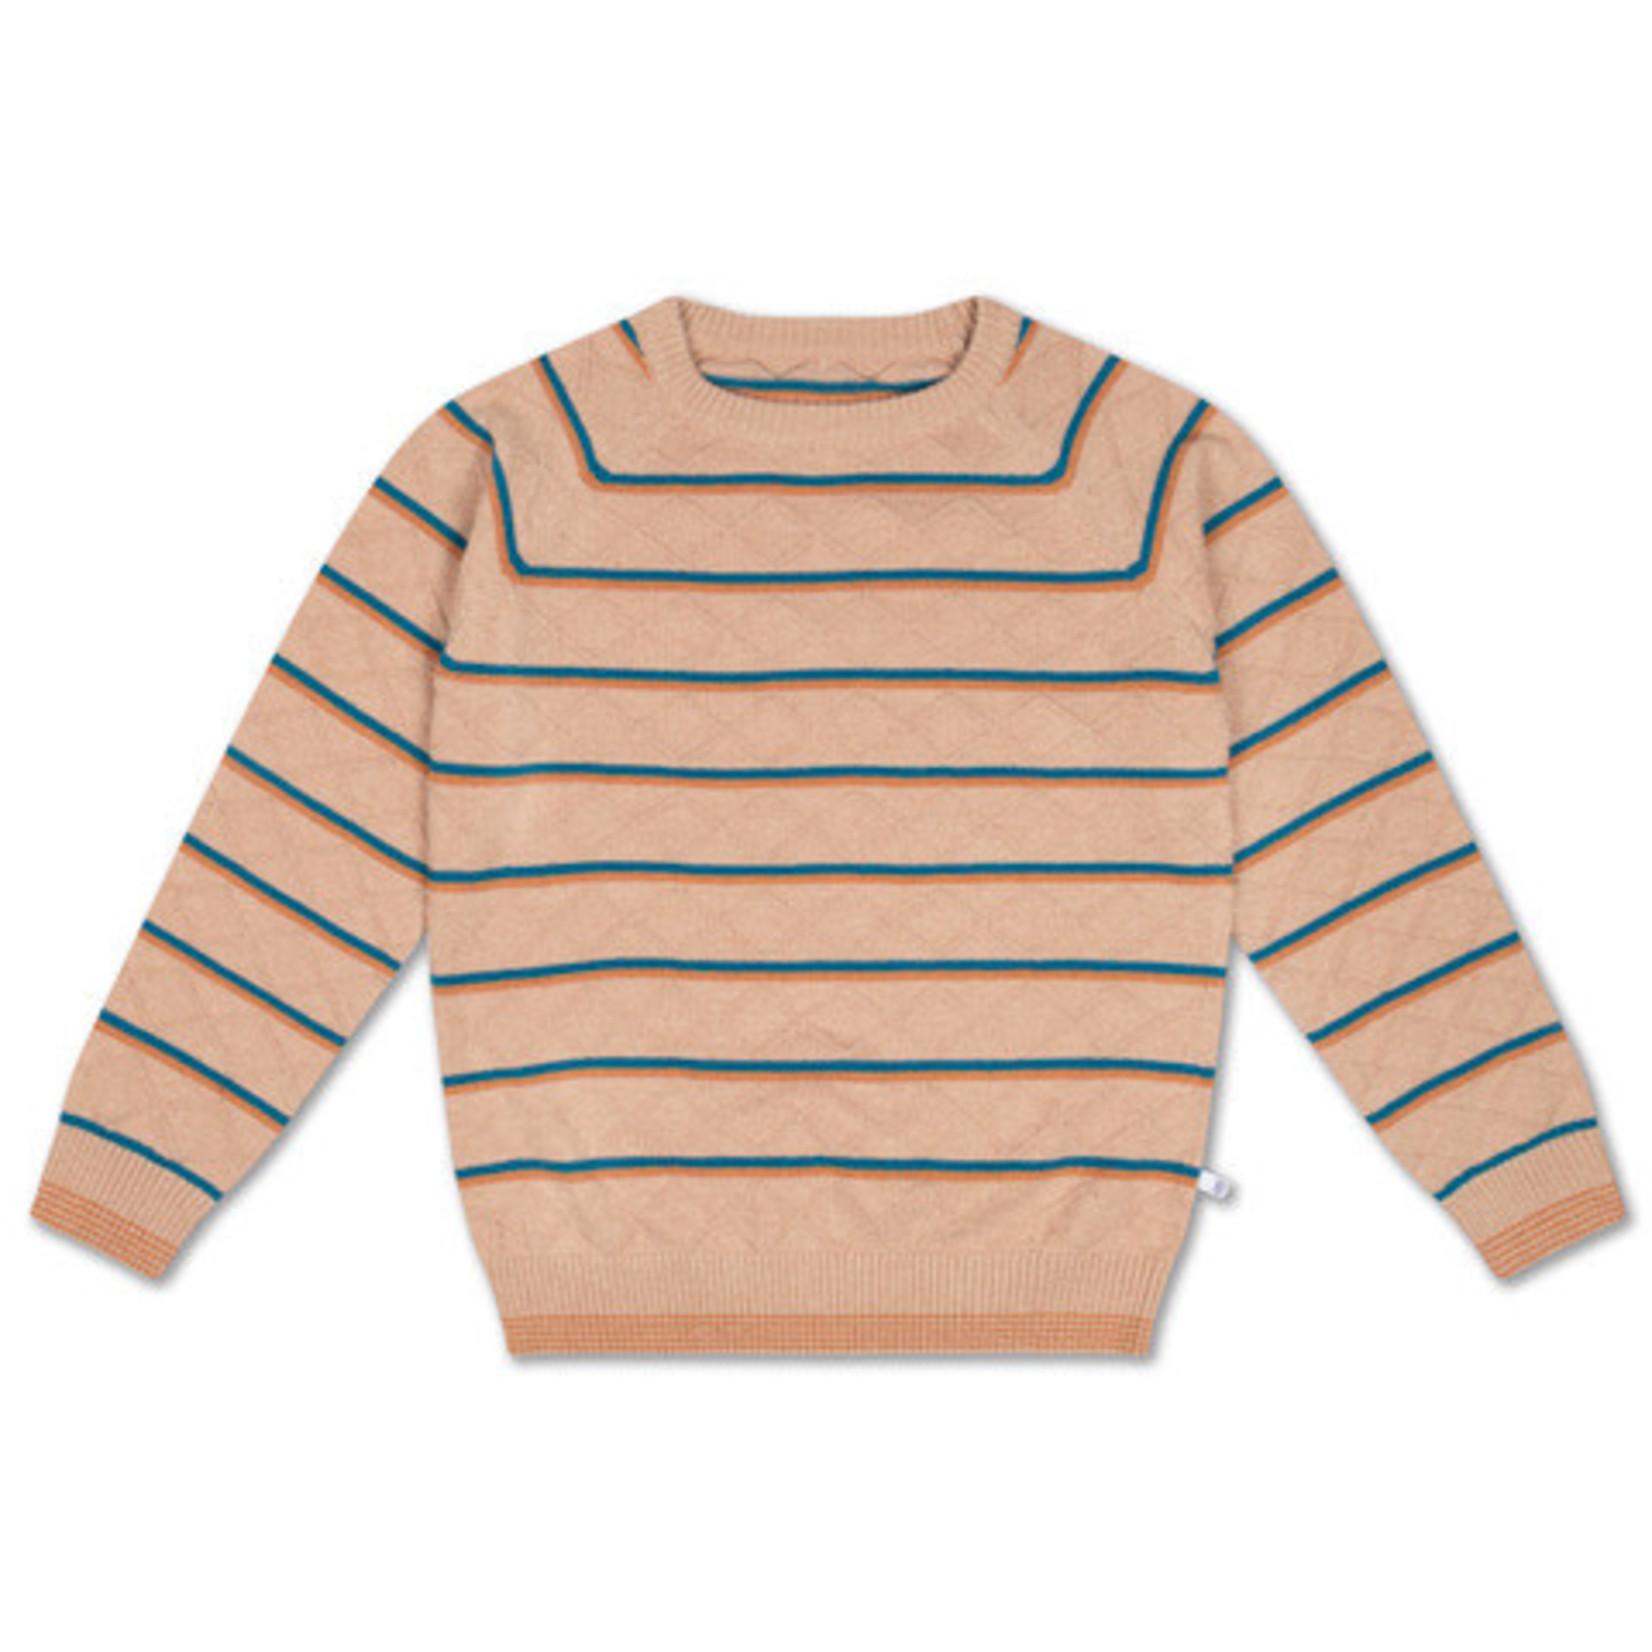 REPOSE AMS REPOSE AMS SALE knit raglan sweater